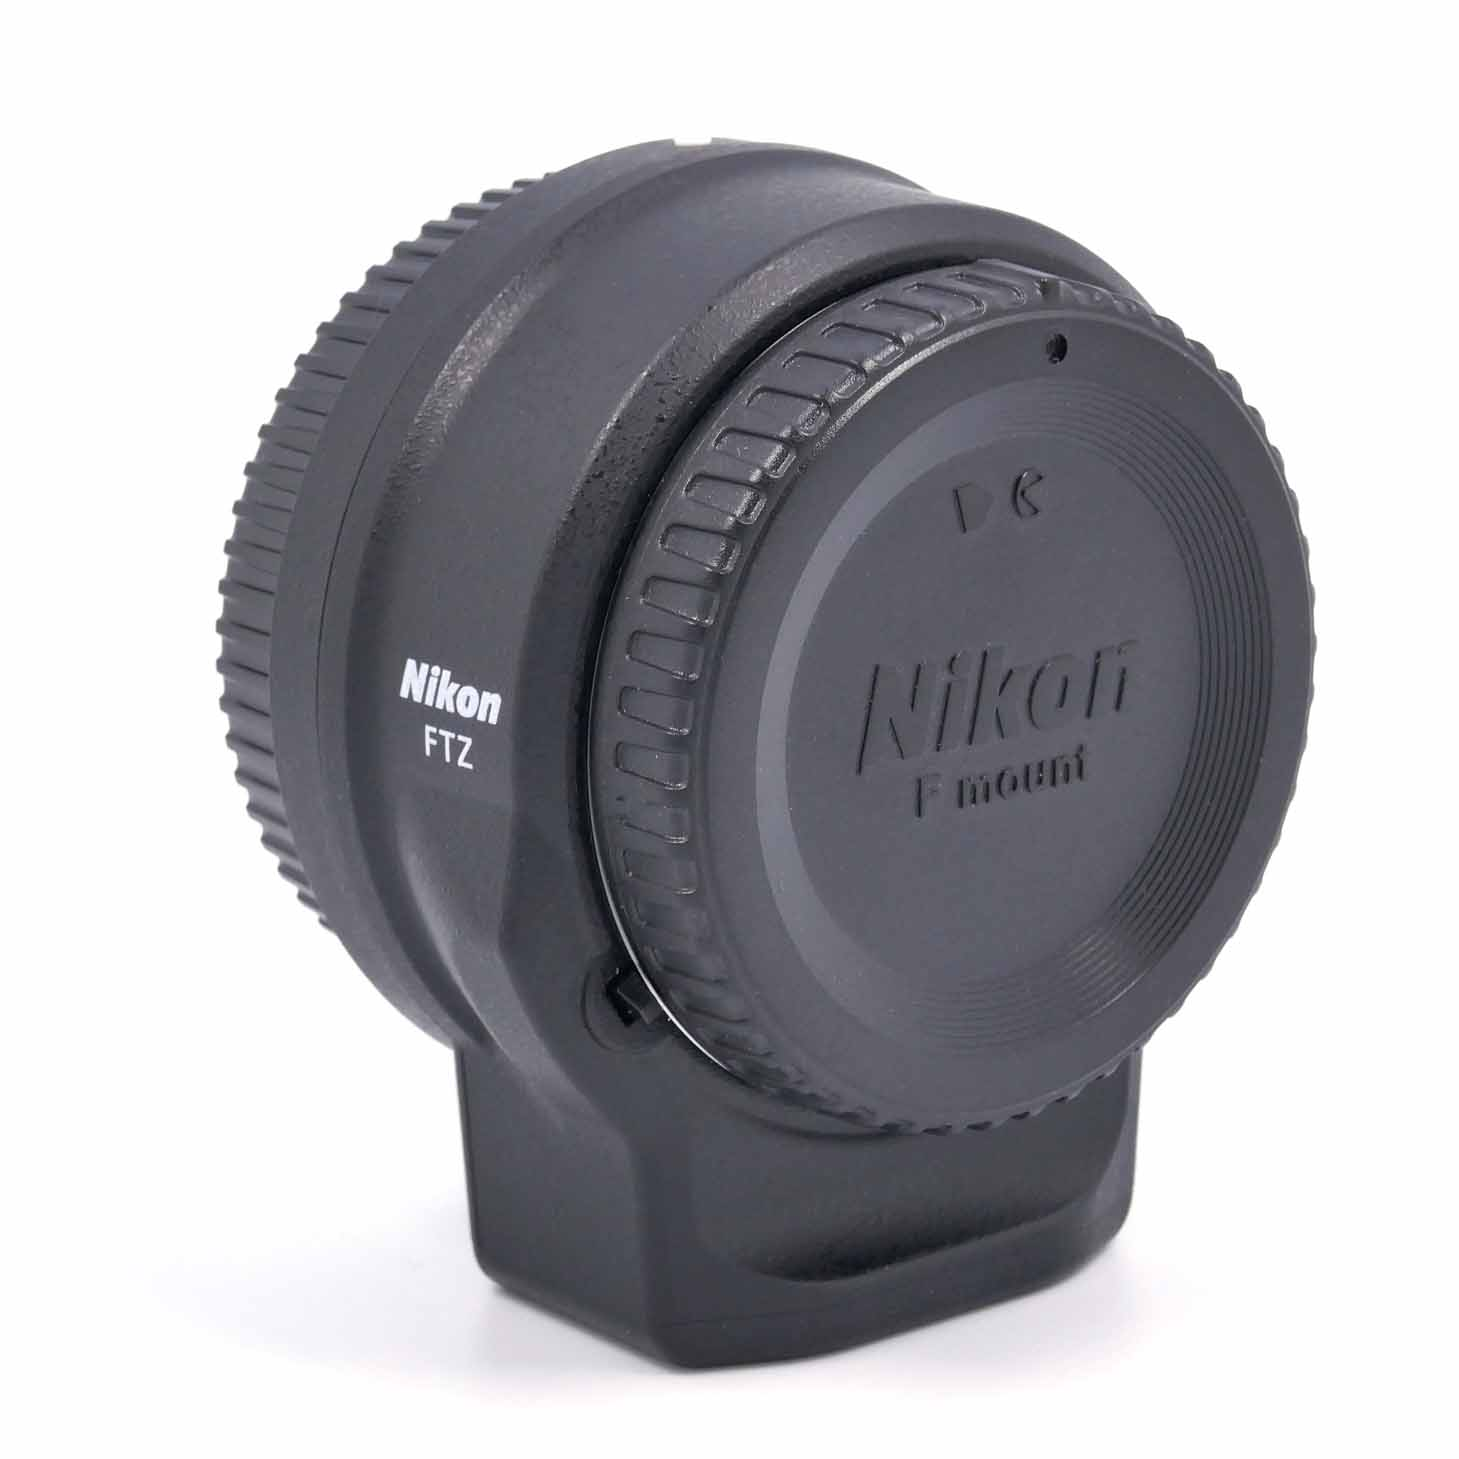 clean-cameras-Nikon-Z6-Kit-24-70-FTZ-09